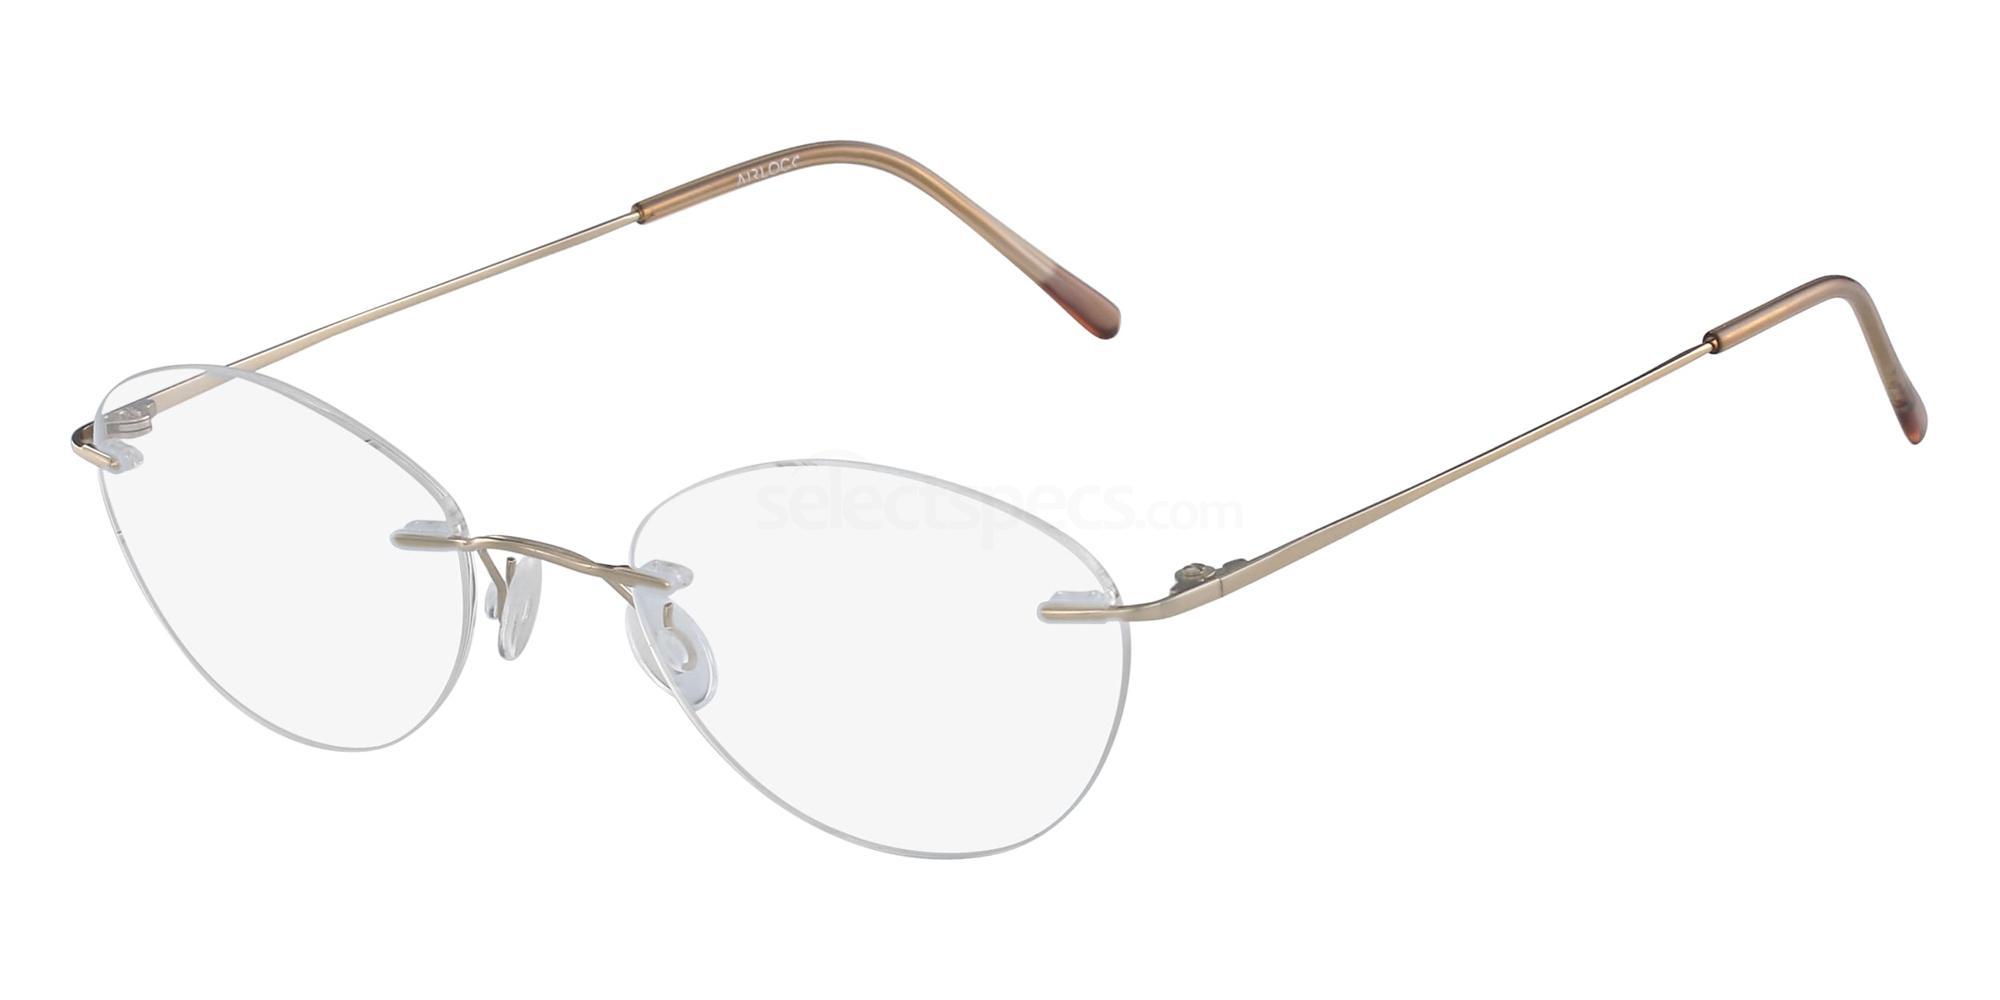 250 SEVEN-SIXTY 202 Glasses, AIRLOCK